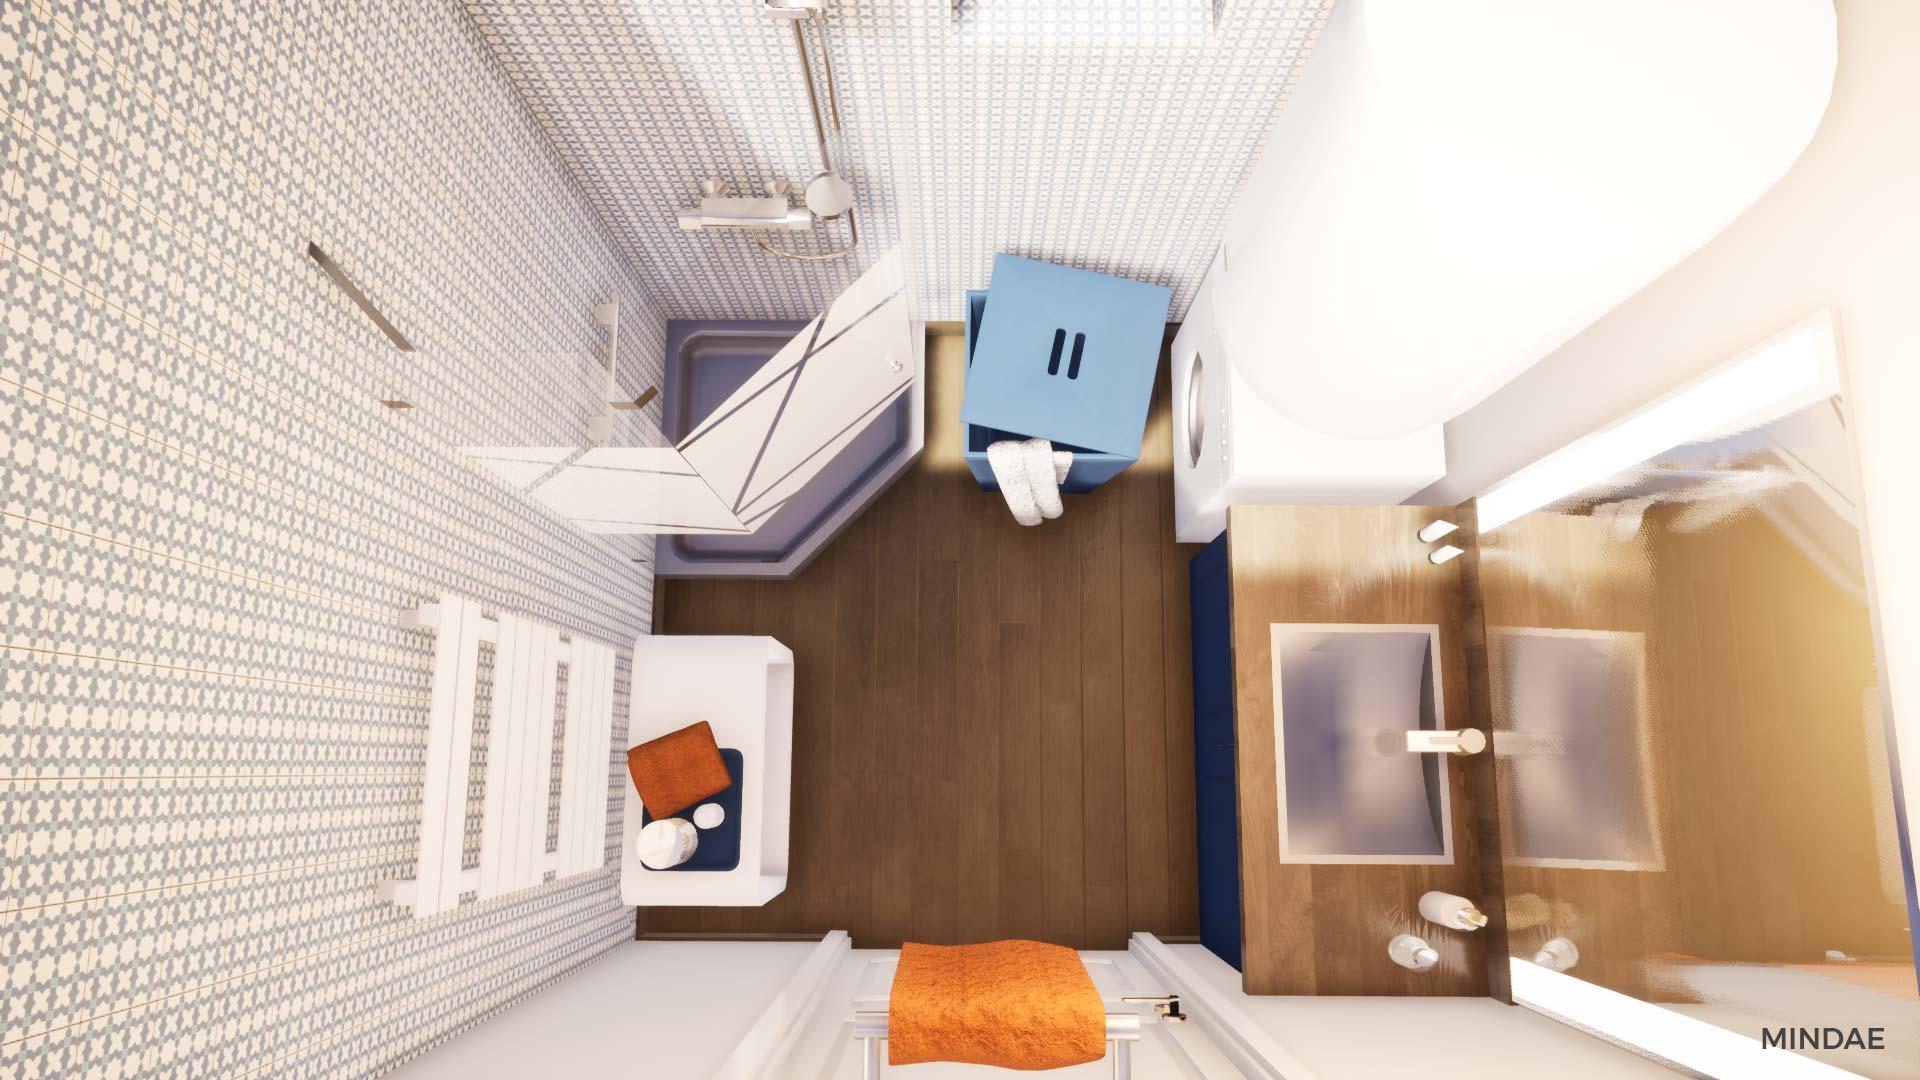 Mindae_3D_appartement_studio_étudiant_homestaging_immobilier_location-(4)